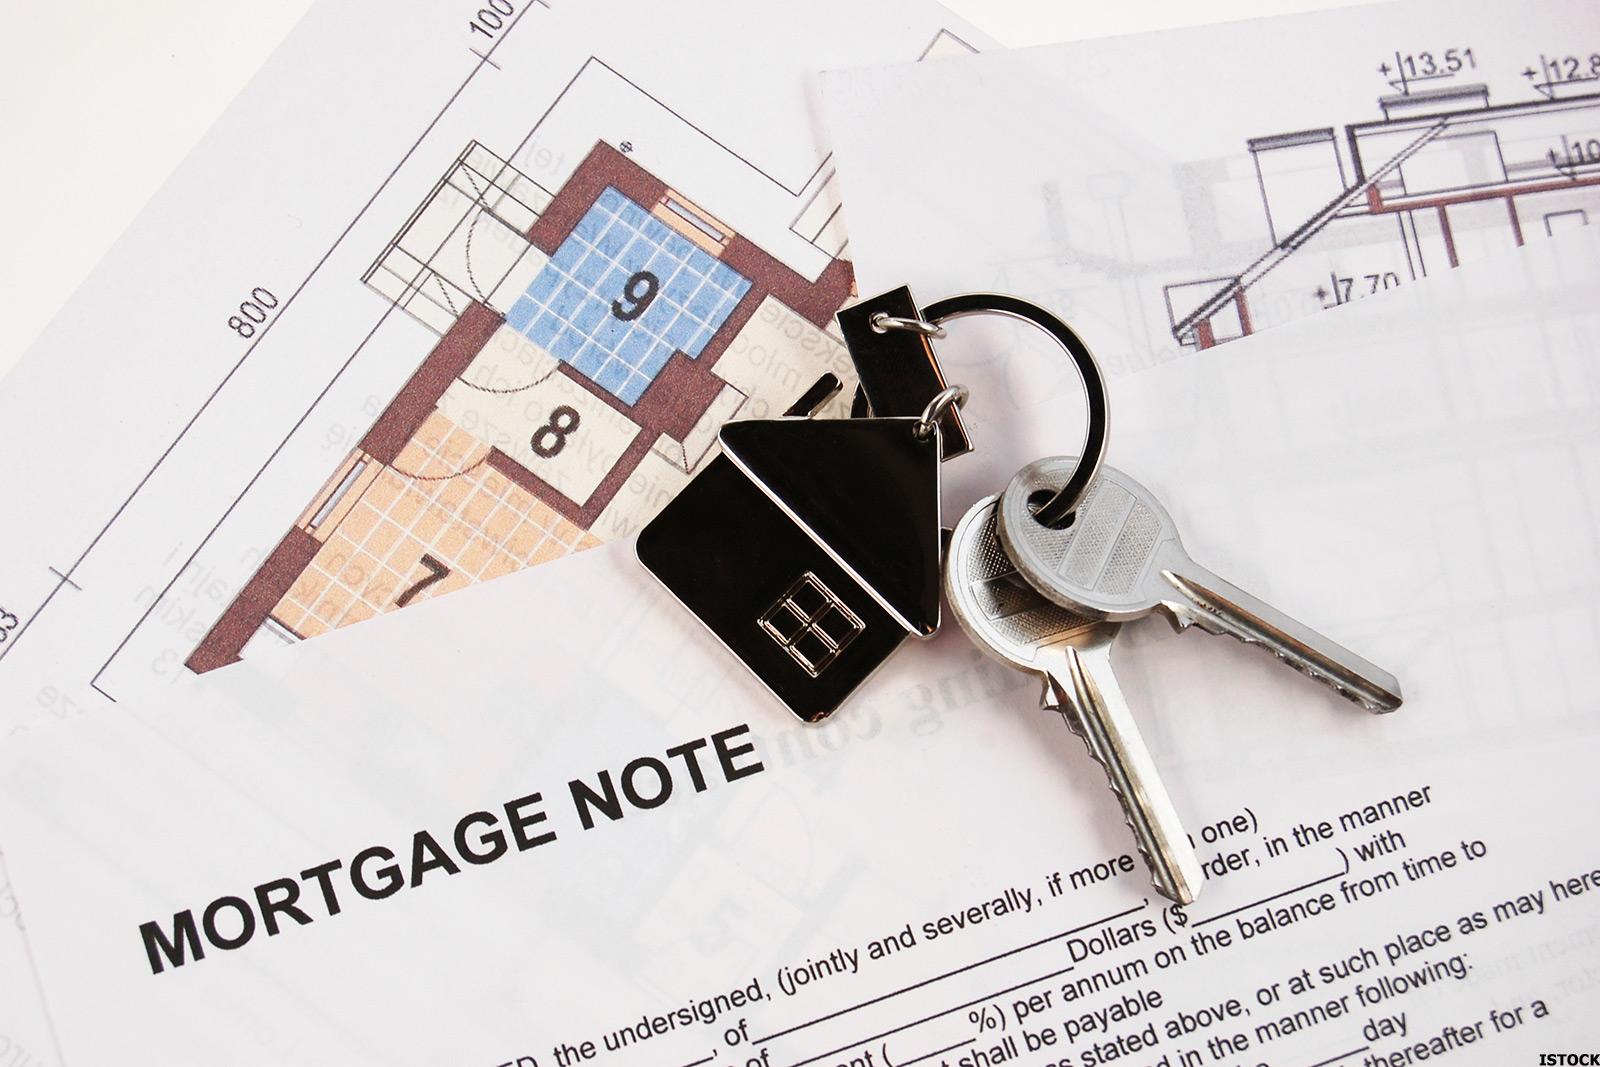 Mortgage Stock Photo.jpg